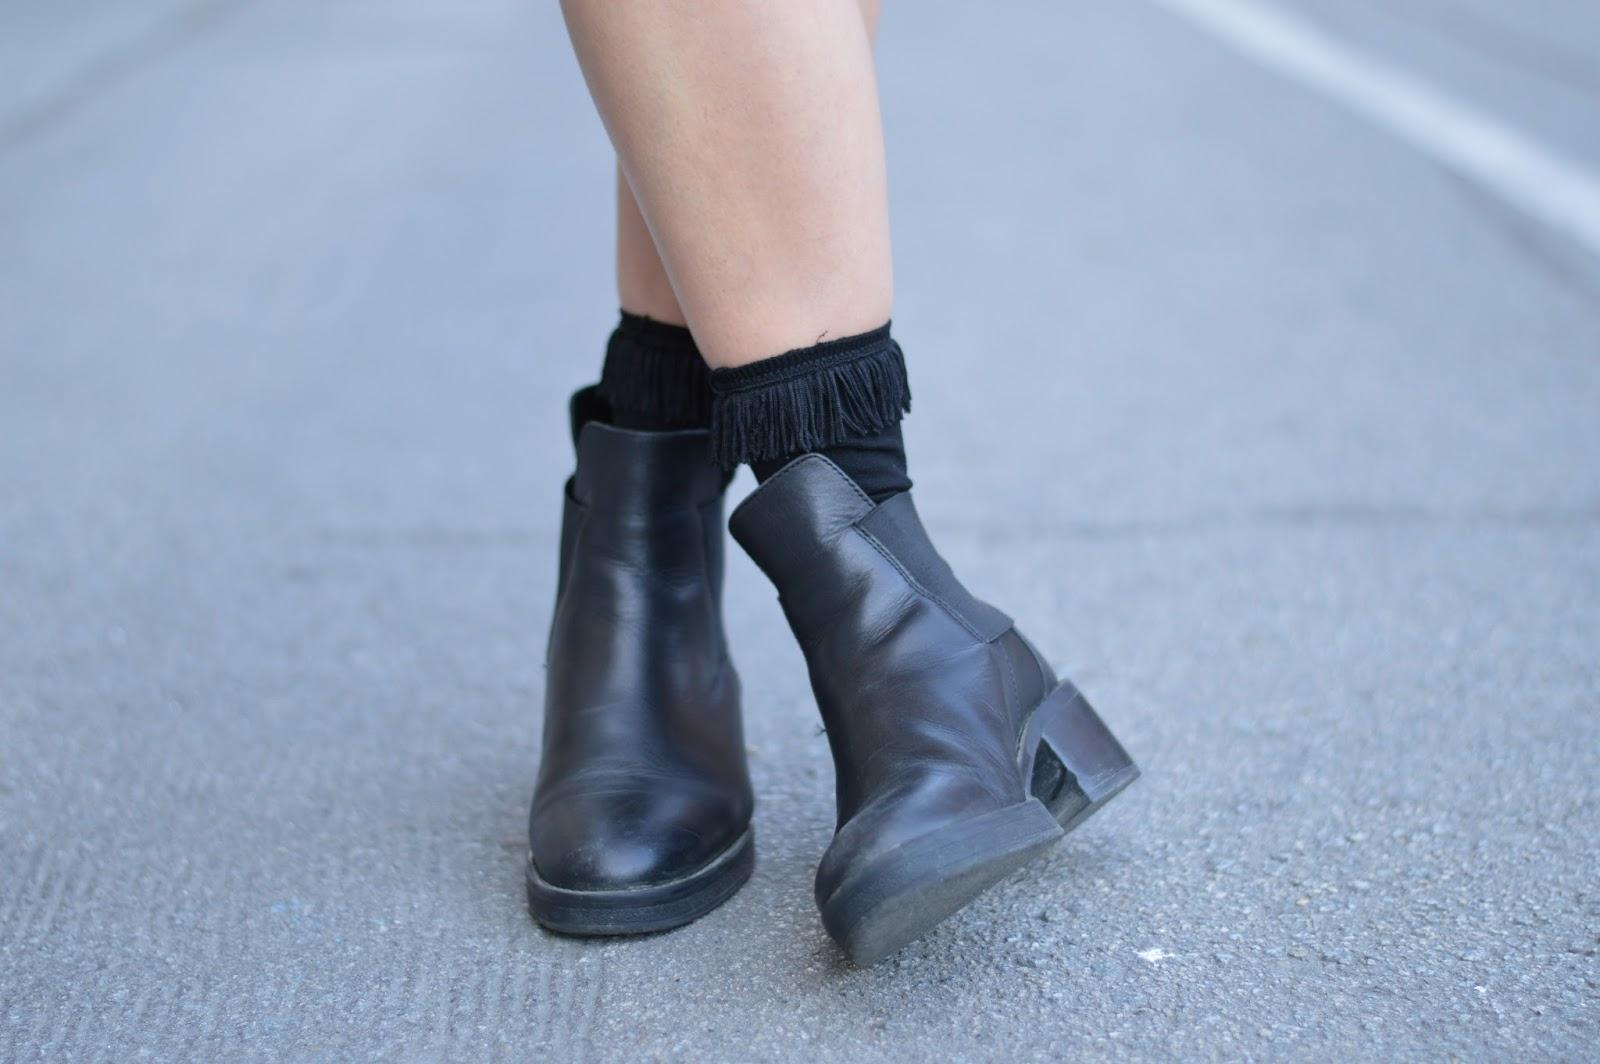 Chelsea boots and tassel socks